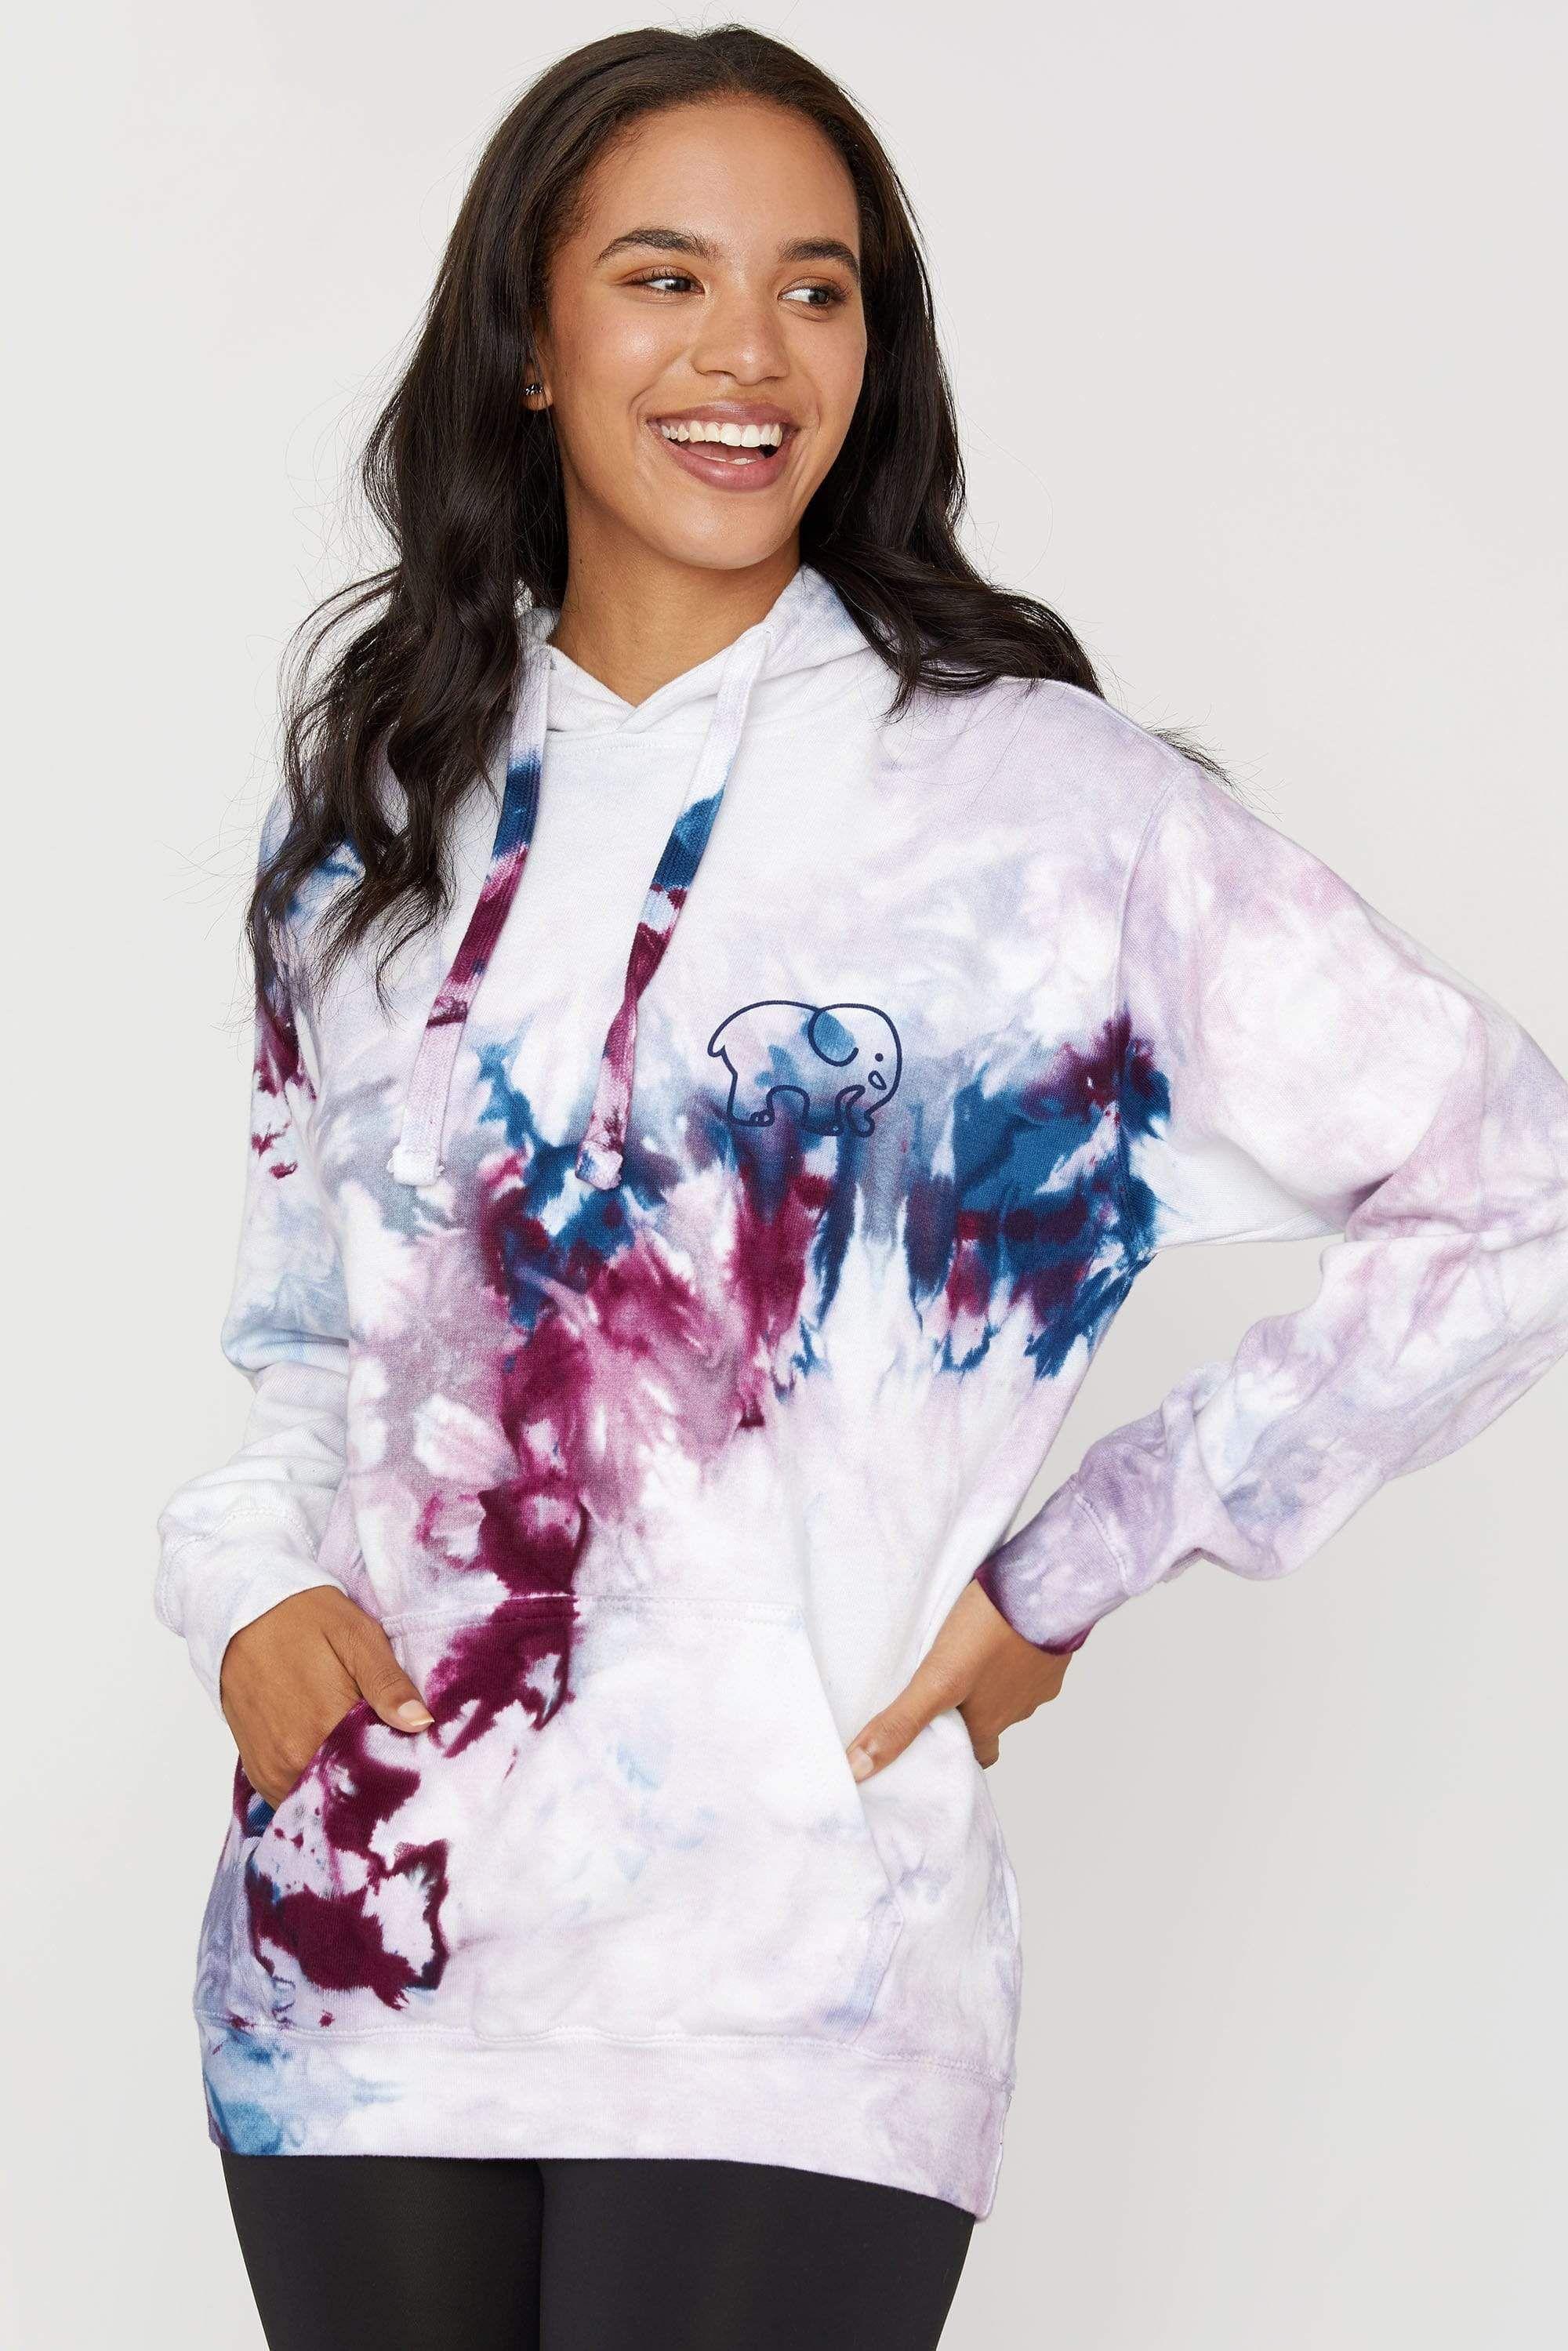 Rainbow Tie Dye Oversized Hoodie Rainbow Tie Dye Hoodie Tie Dye Hoodie Tie Dye [ 1023 x 1024 Pixel ]